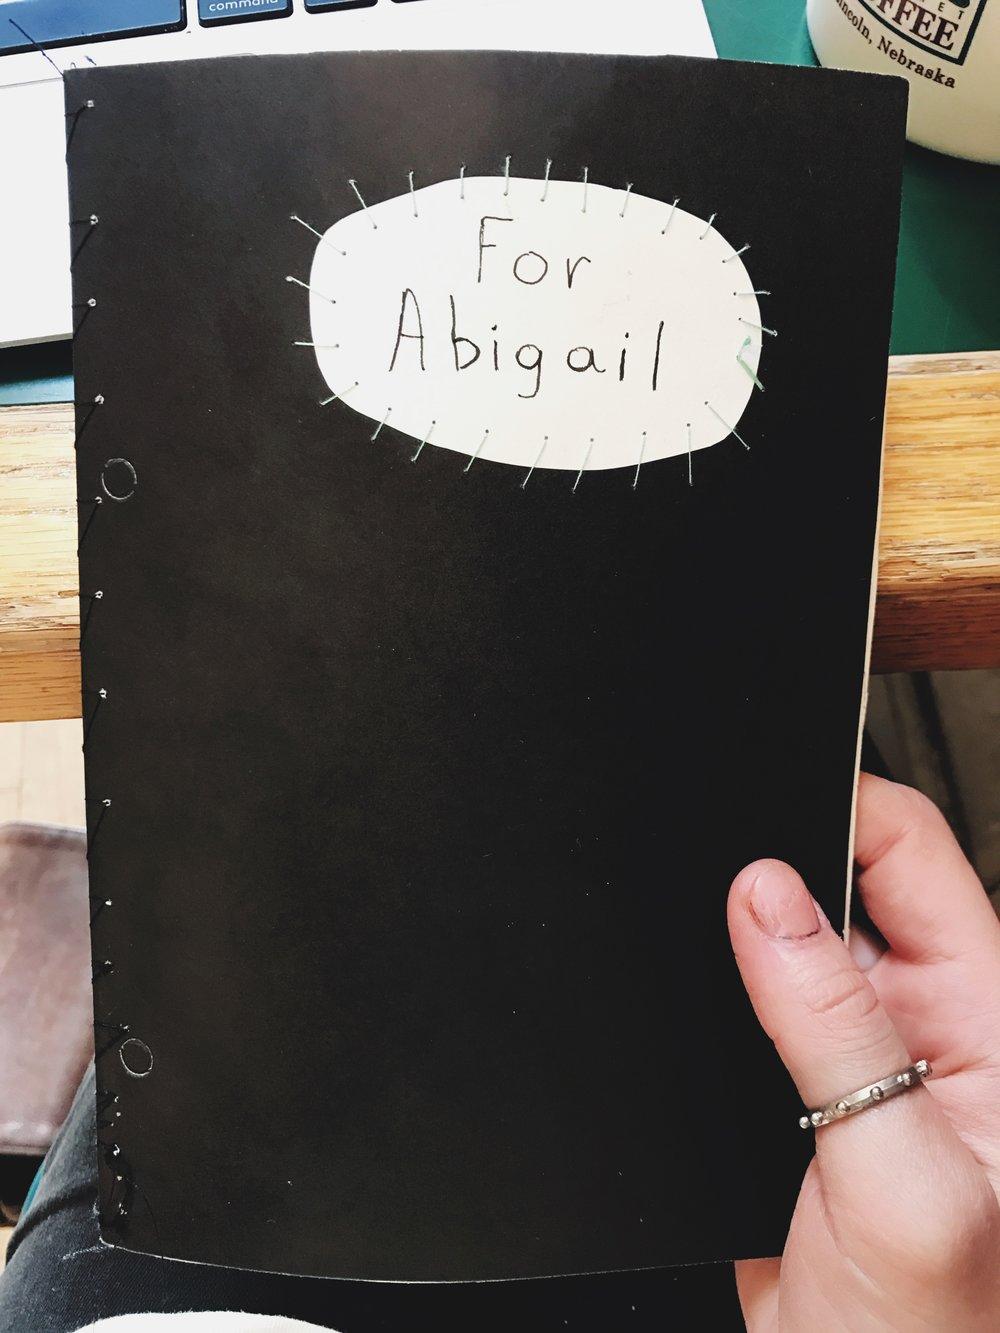 said book